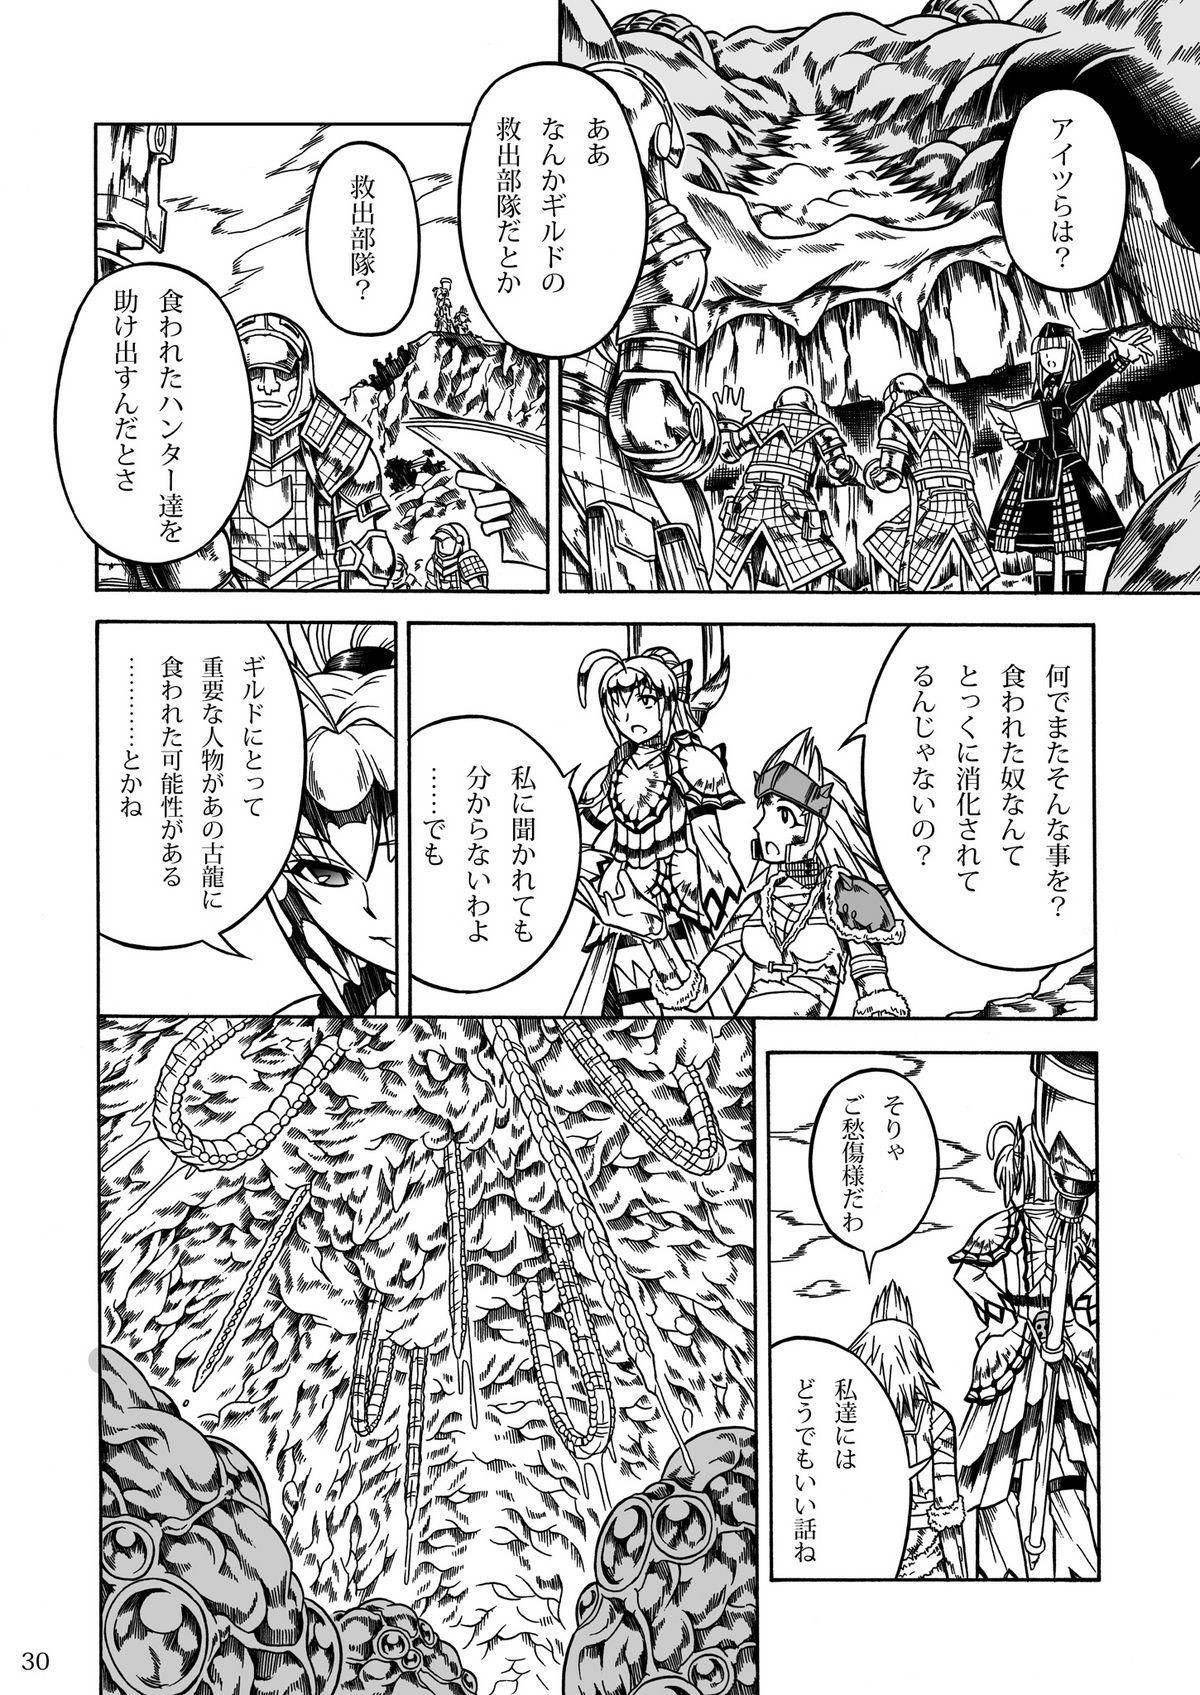 Solo Hunter no Seitai 2 The third part 29